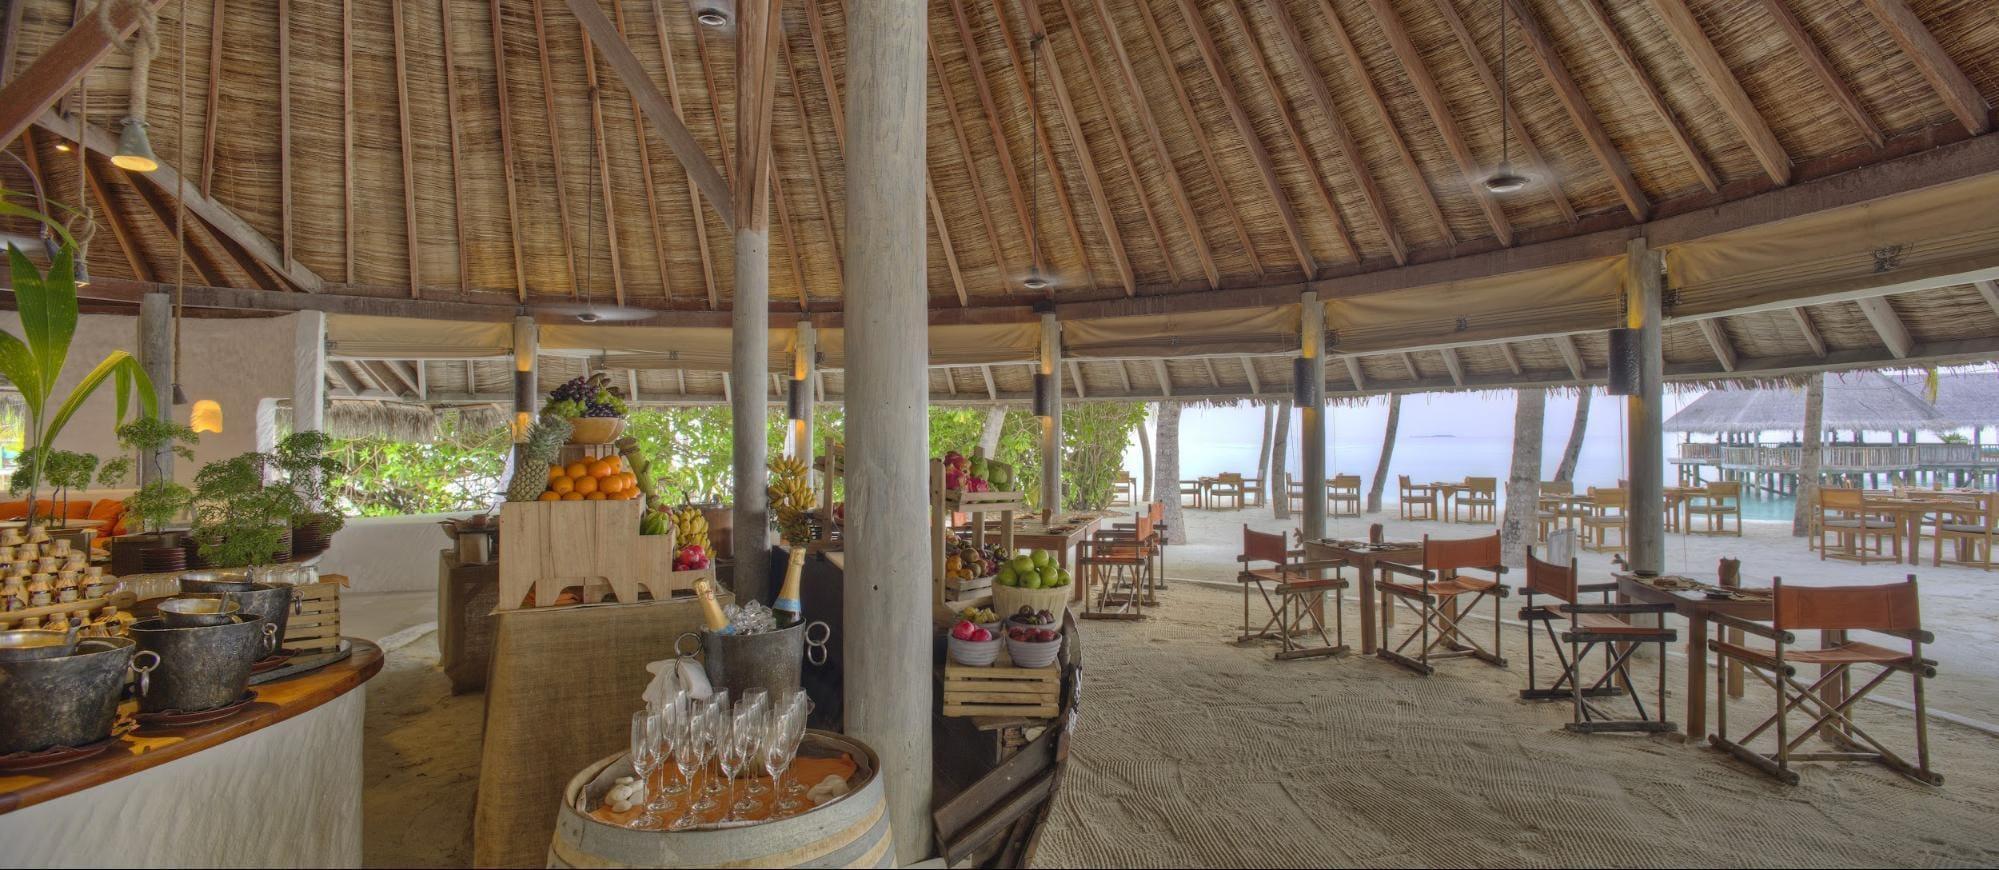 Breakfast at Gili Lankanfushi - Courtesy of Gili Lankanfushi